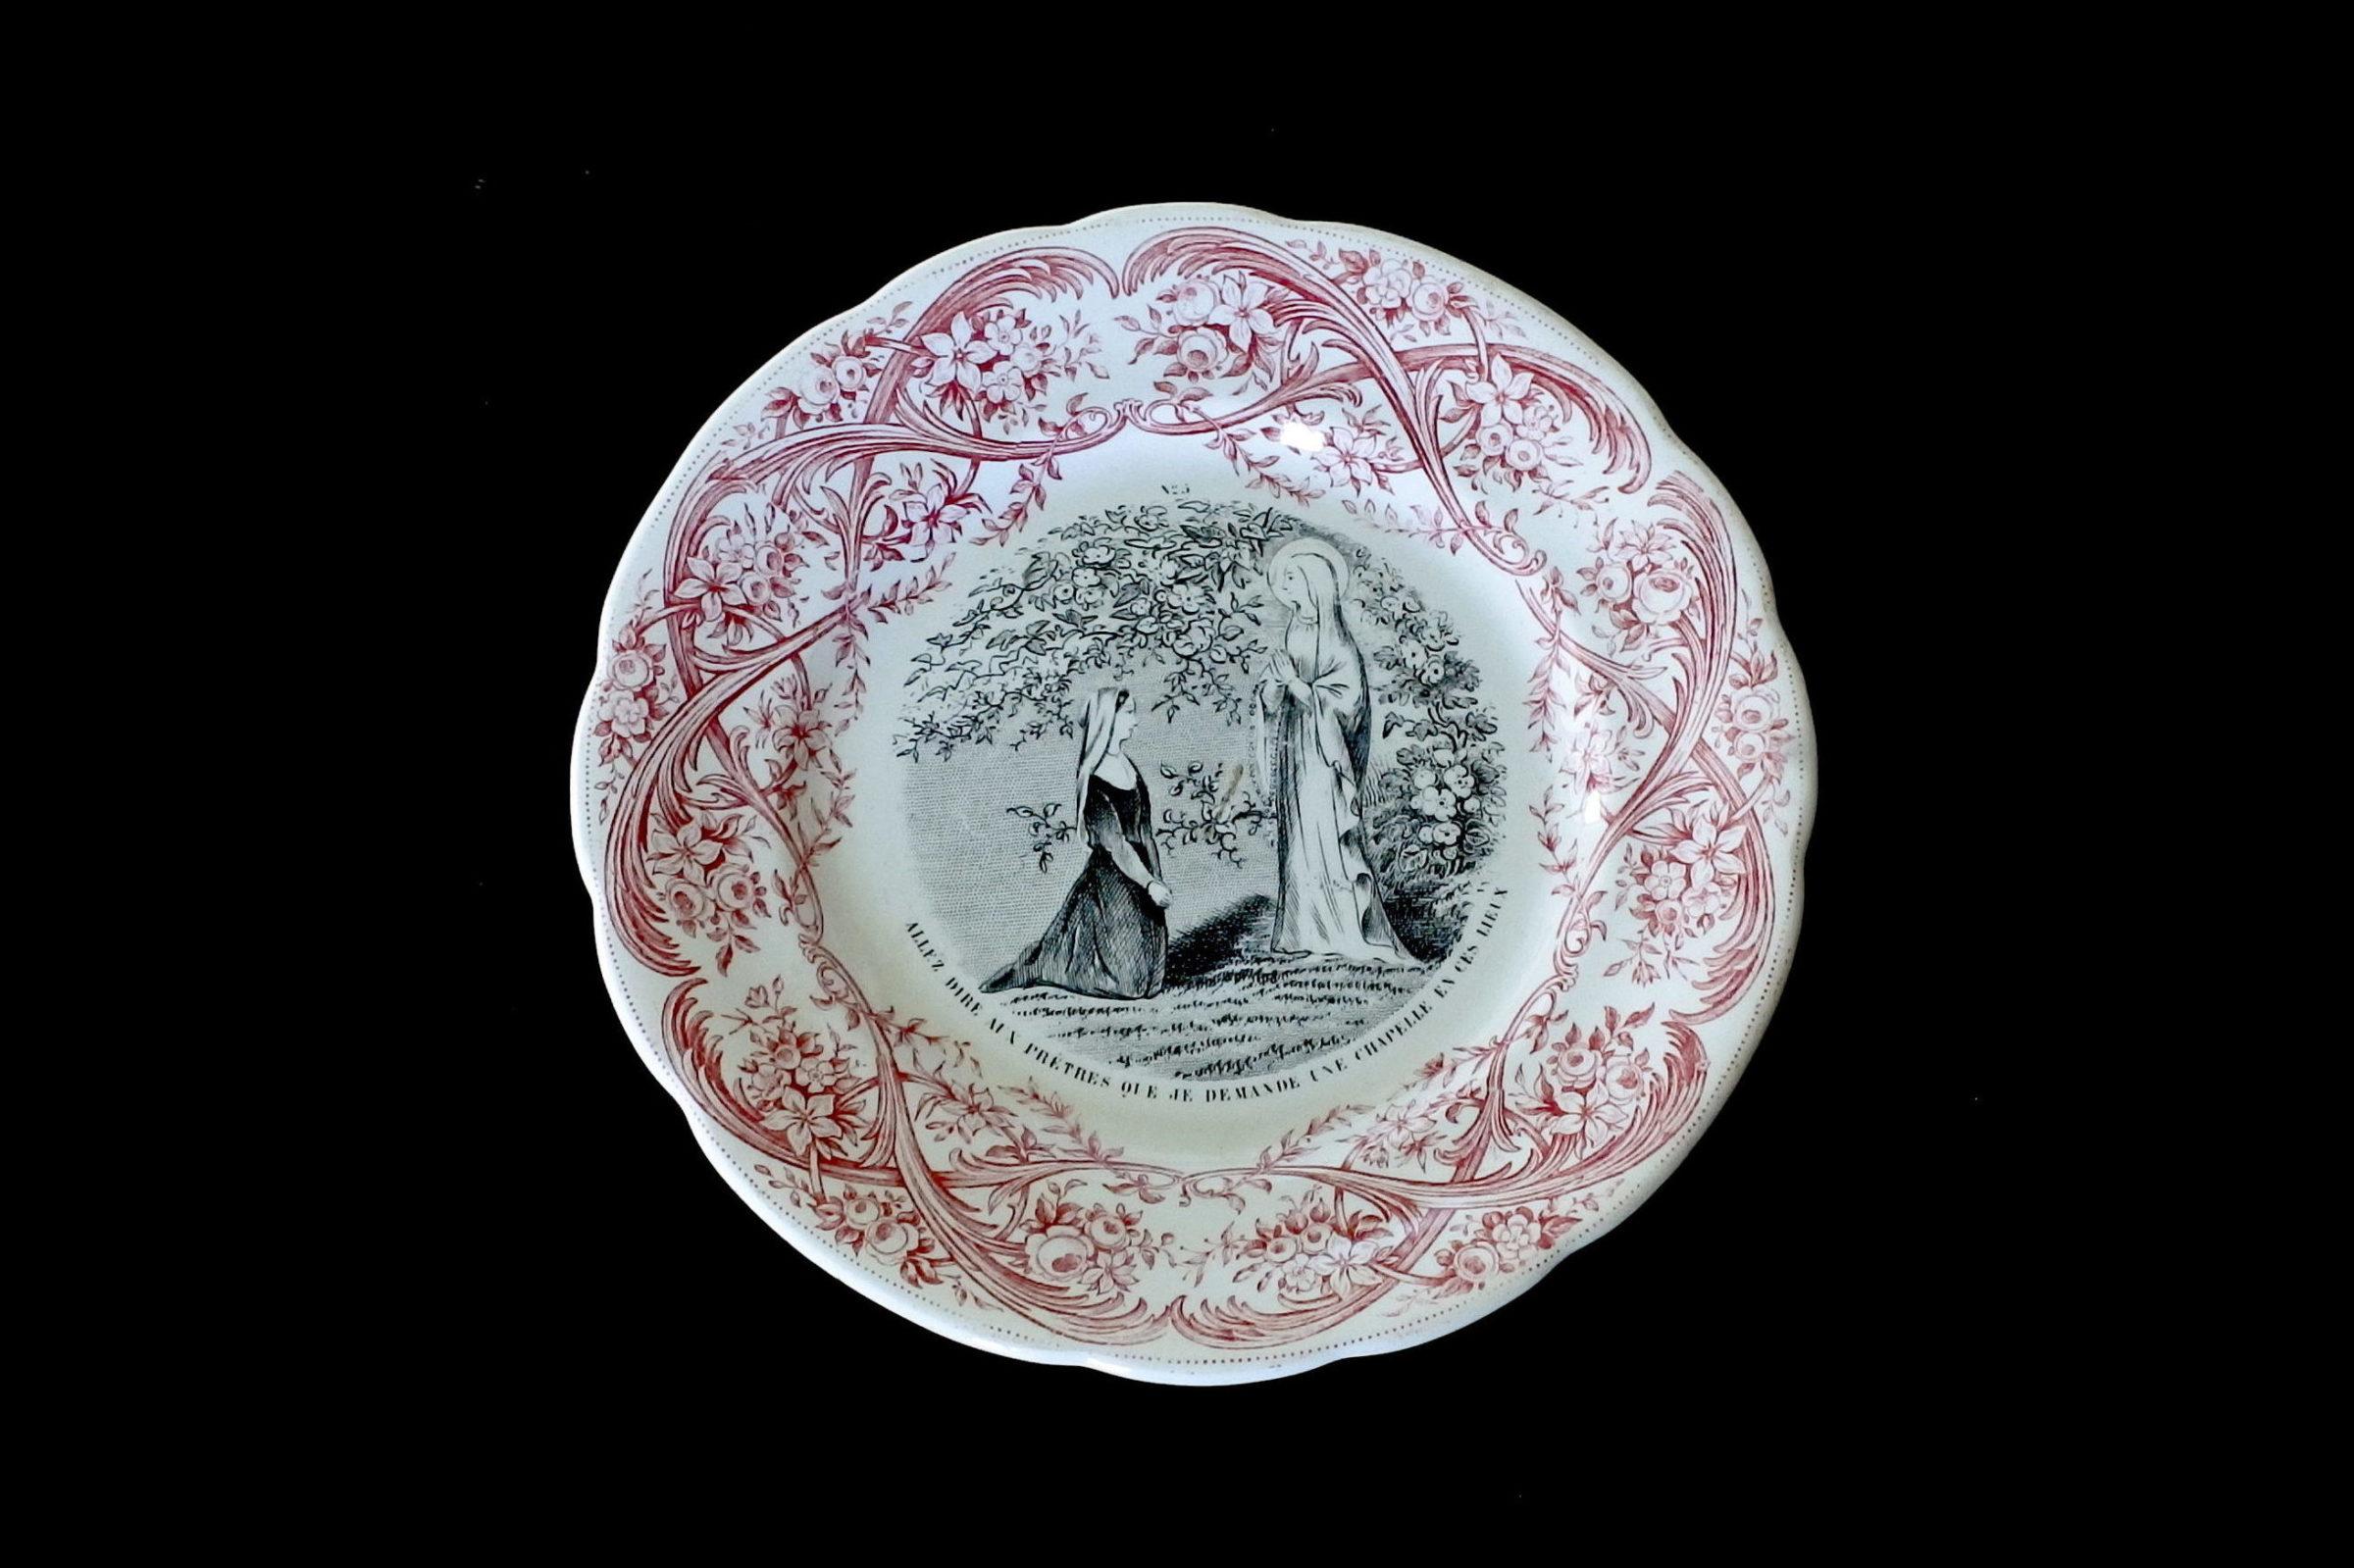 Serie completa di 12 piatti in ceramica dedicati alla vita di Bernadette - 6